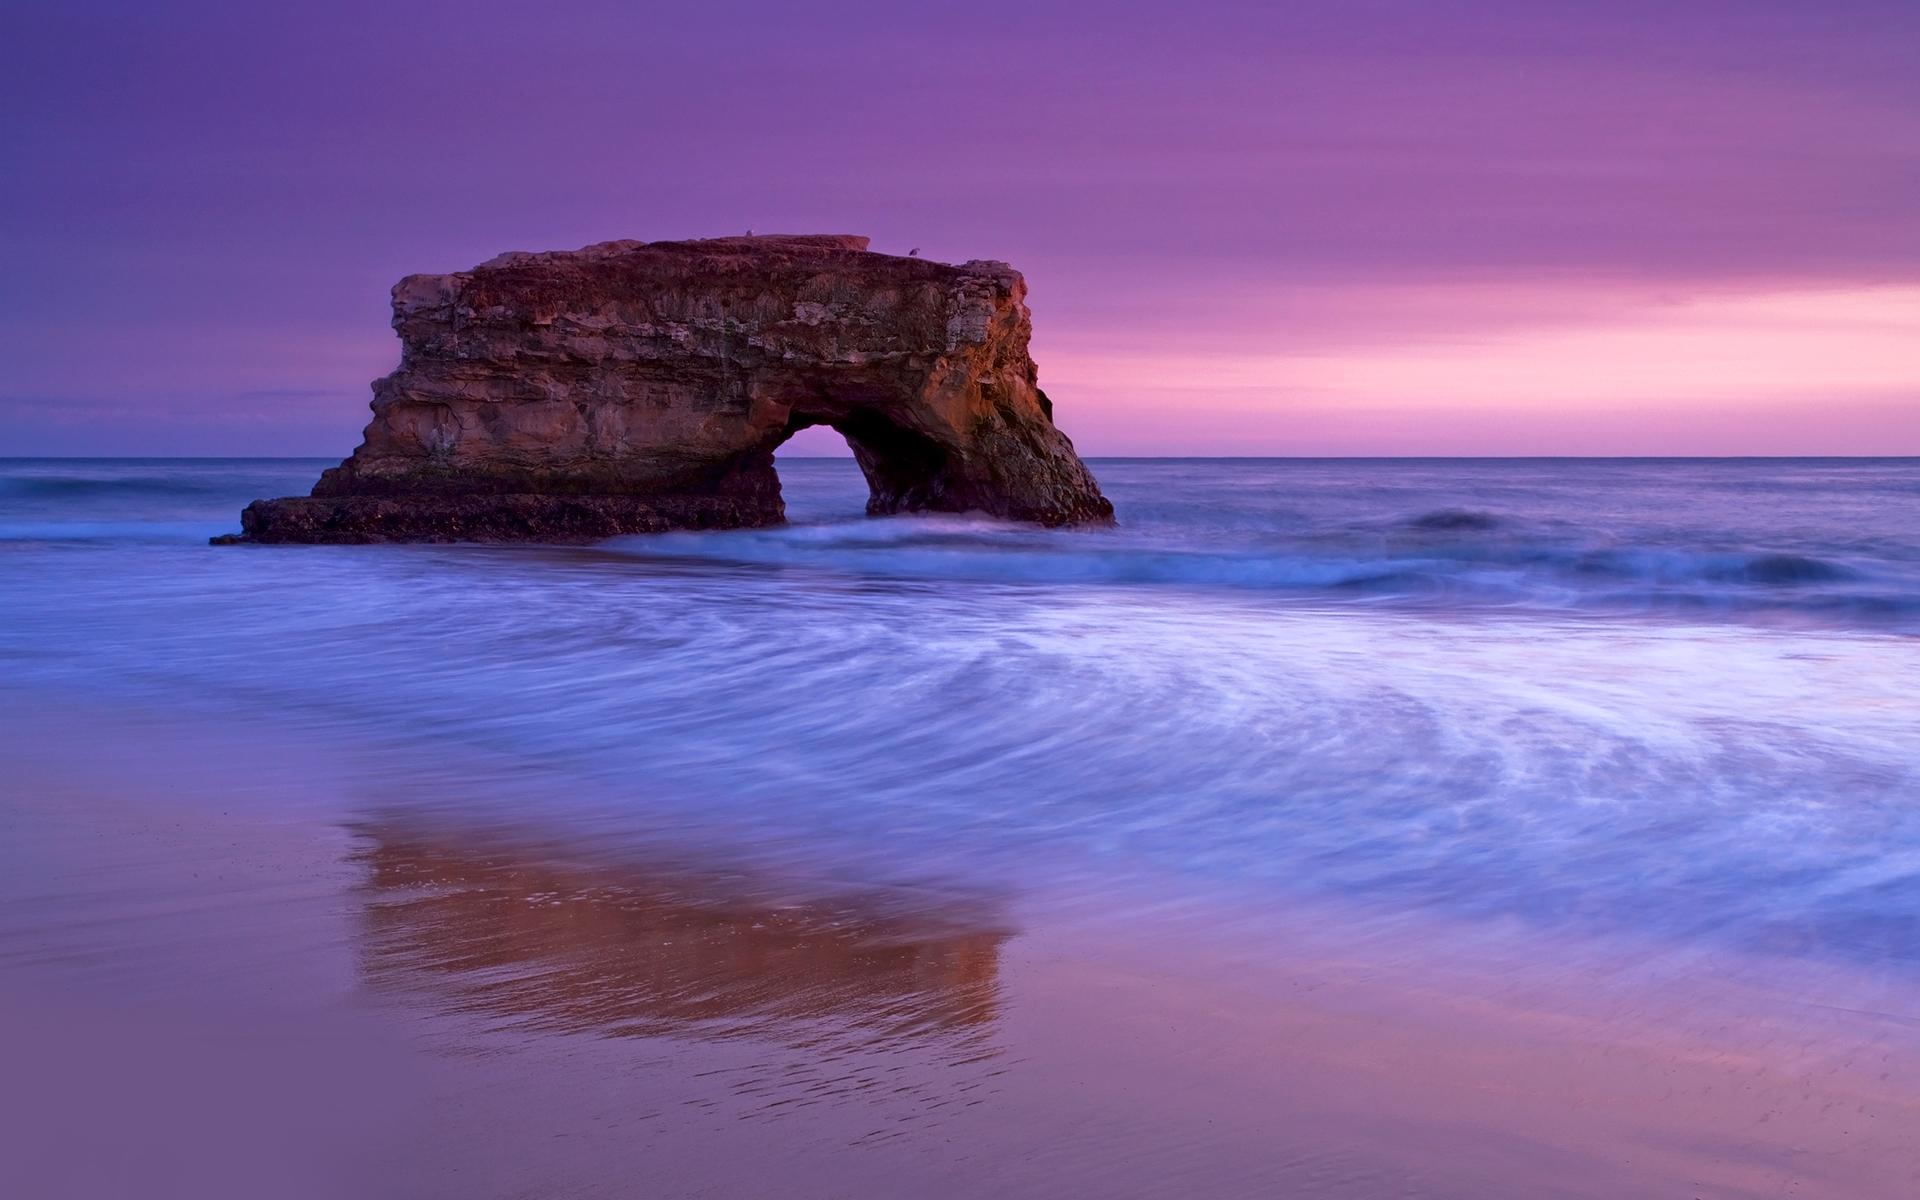 море вечер камни бесплатно